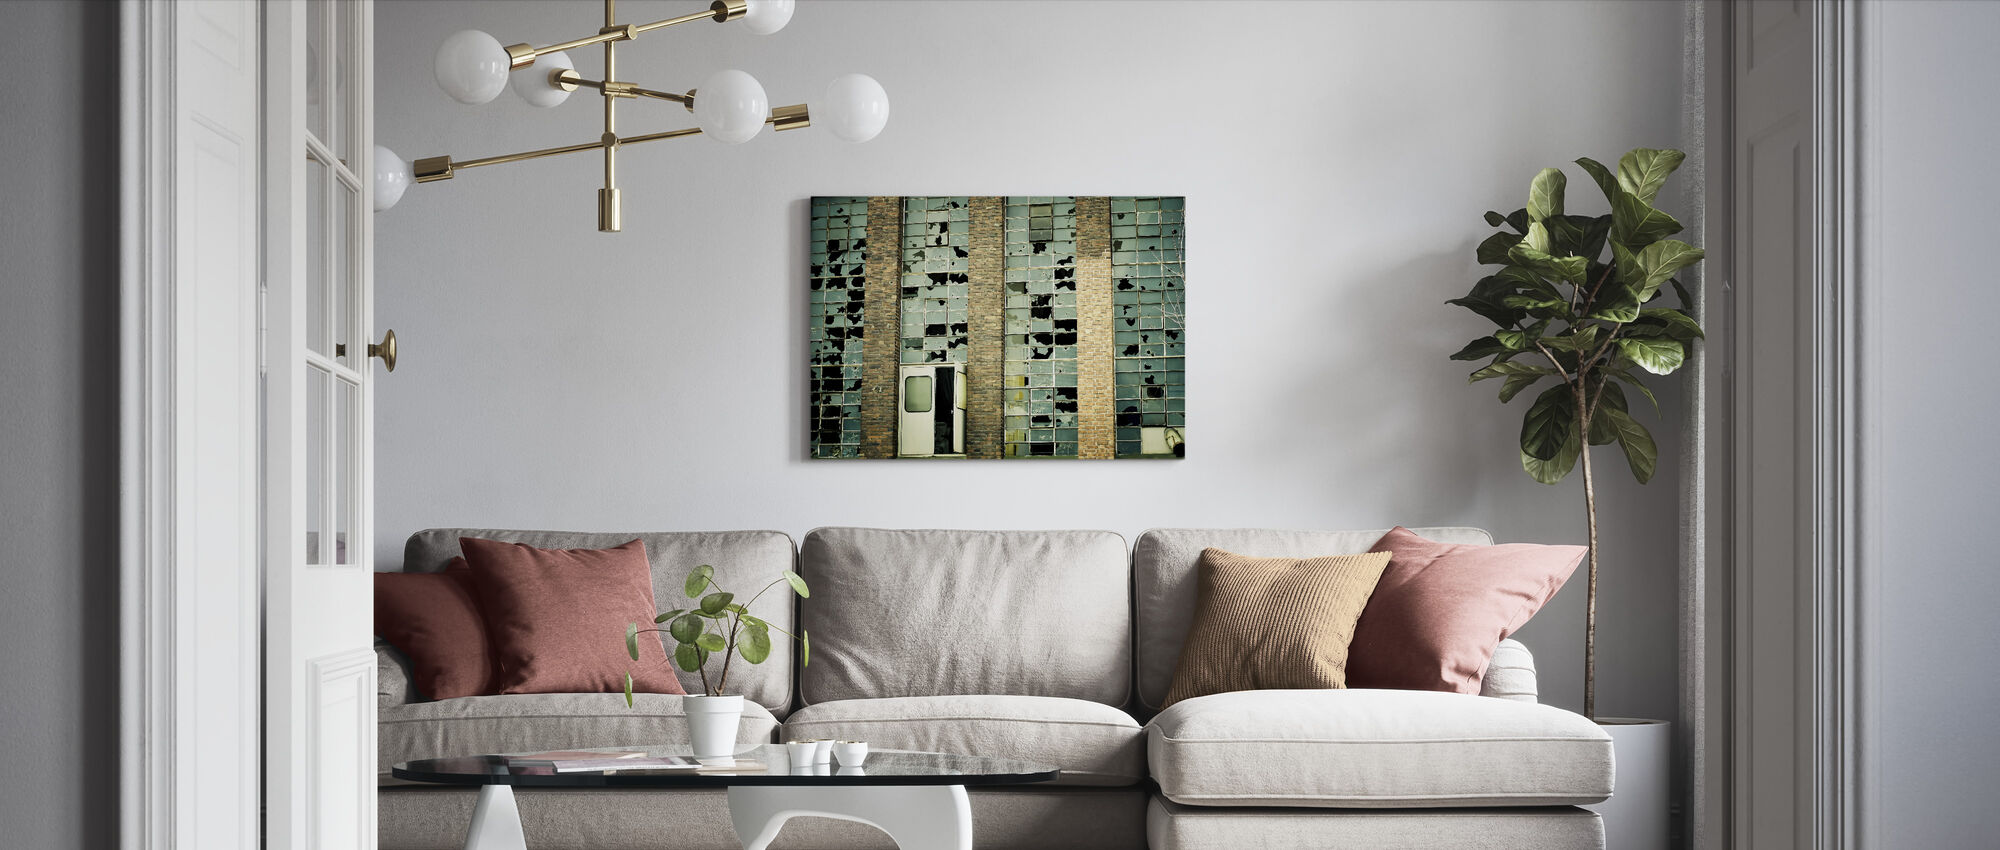 Broken Factory Glasses - Canvas print - Living Room